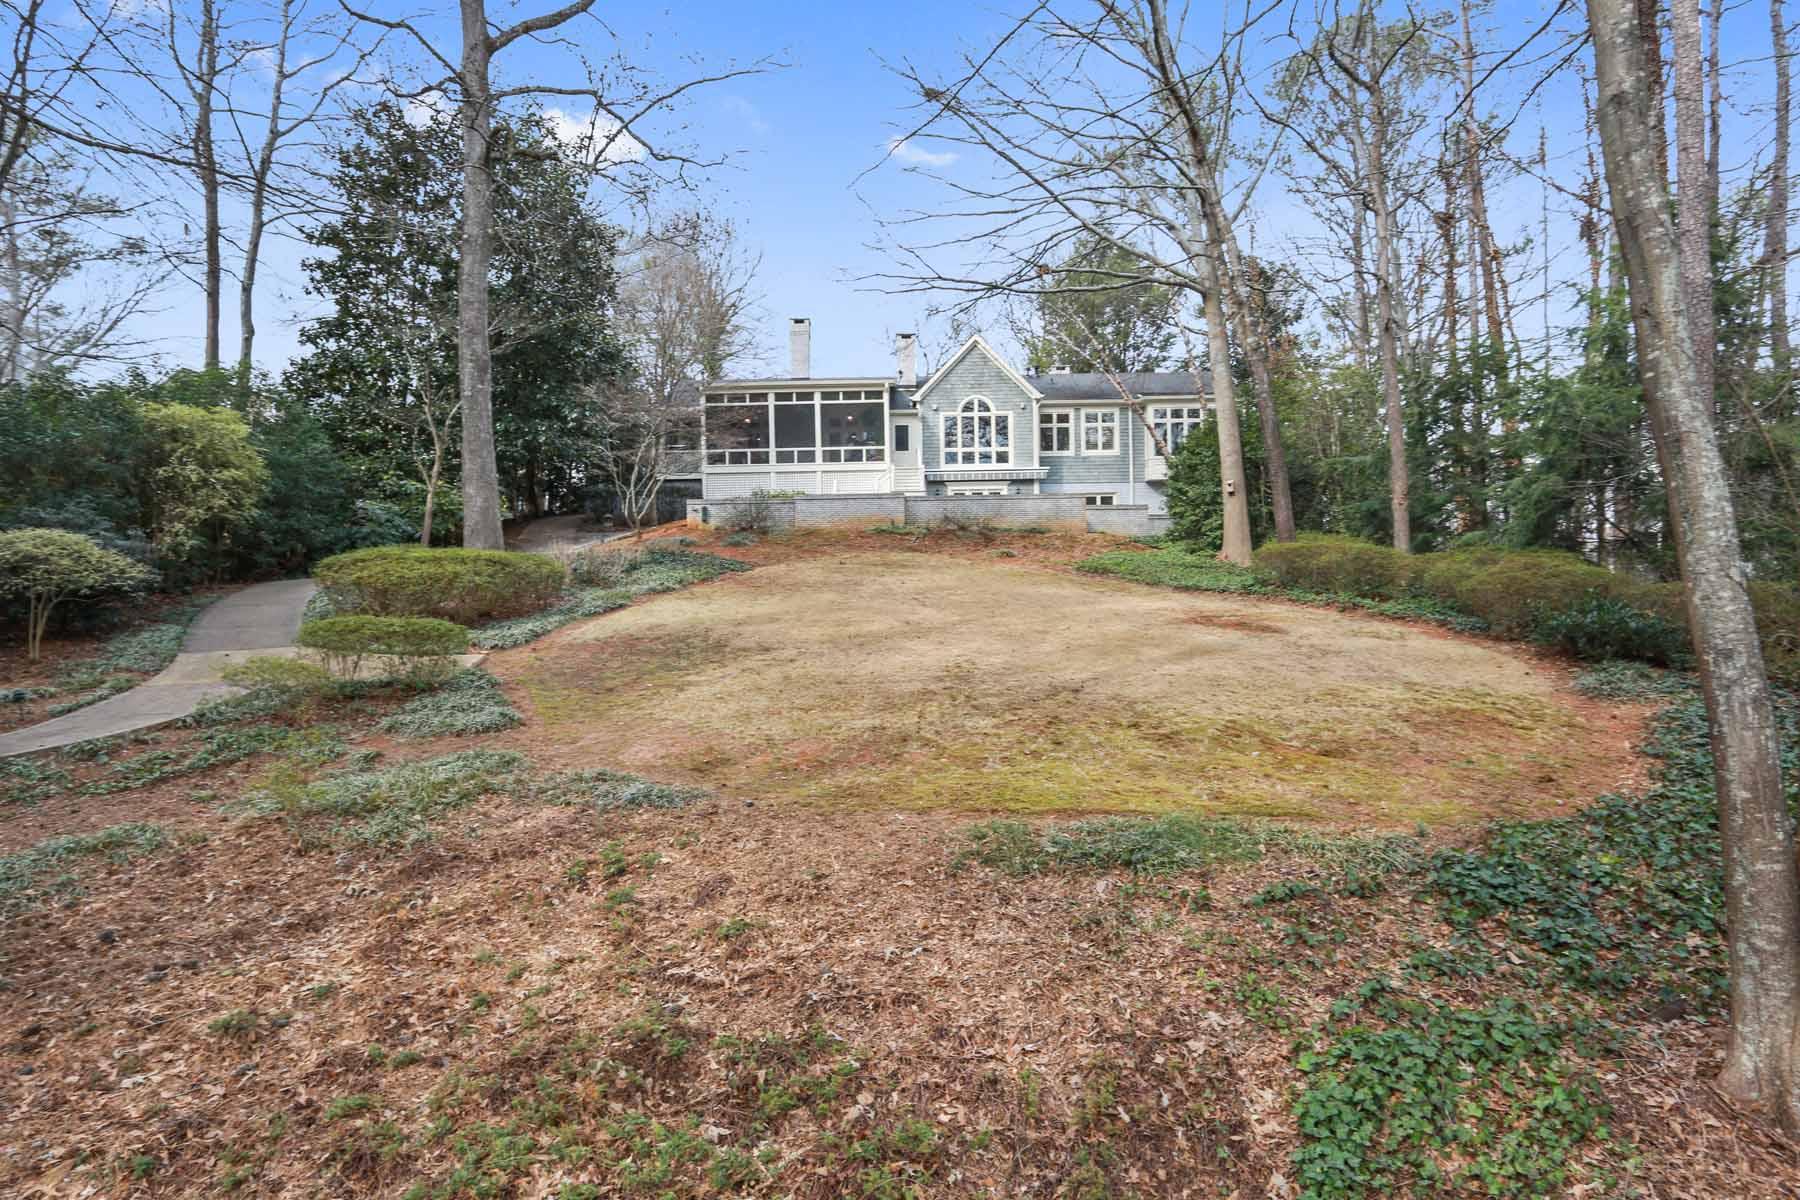 Single Family Home for Sale at Serene & Private Retreat on Private Lake 1591 Huntingdon Trail Atlanta, Georgia, 30350 United States